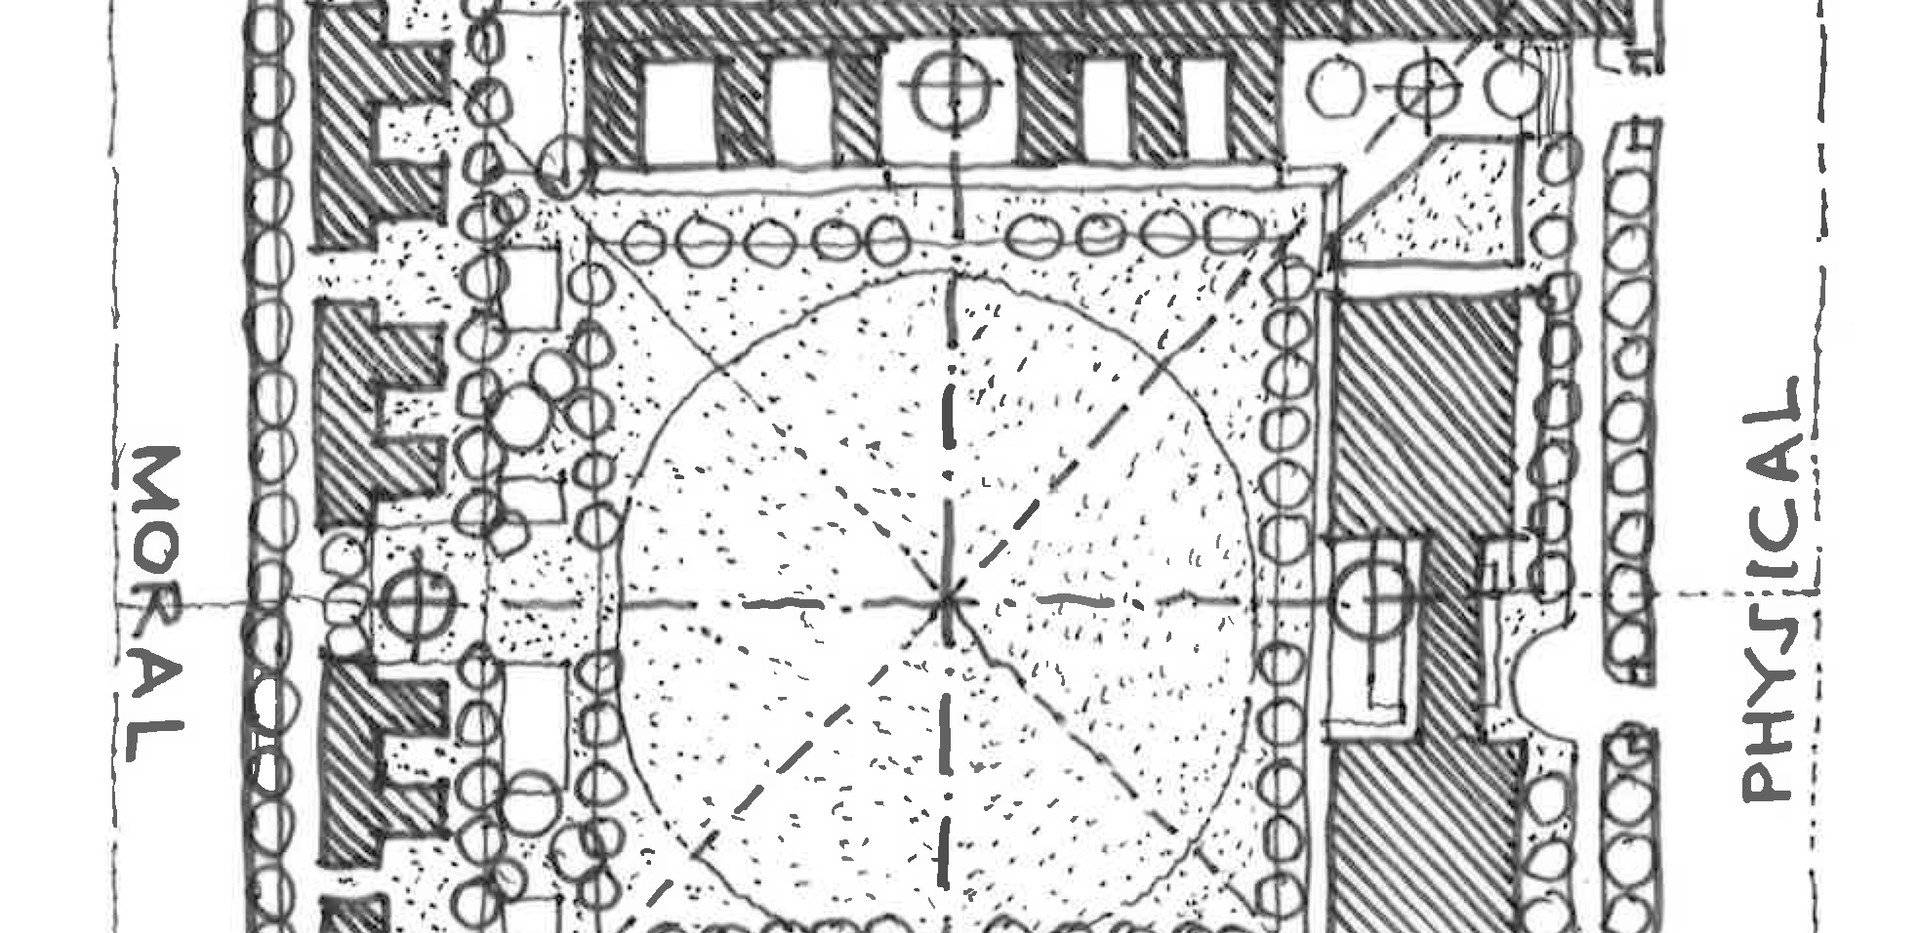 Masterplan Concept Sketch